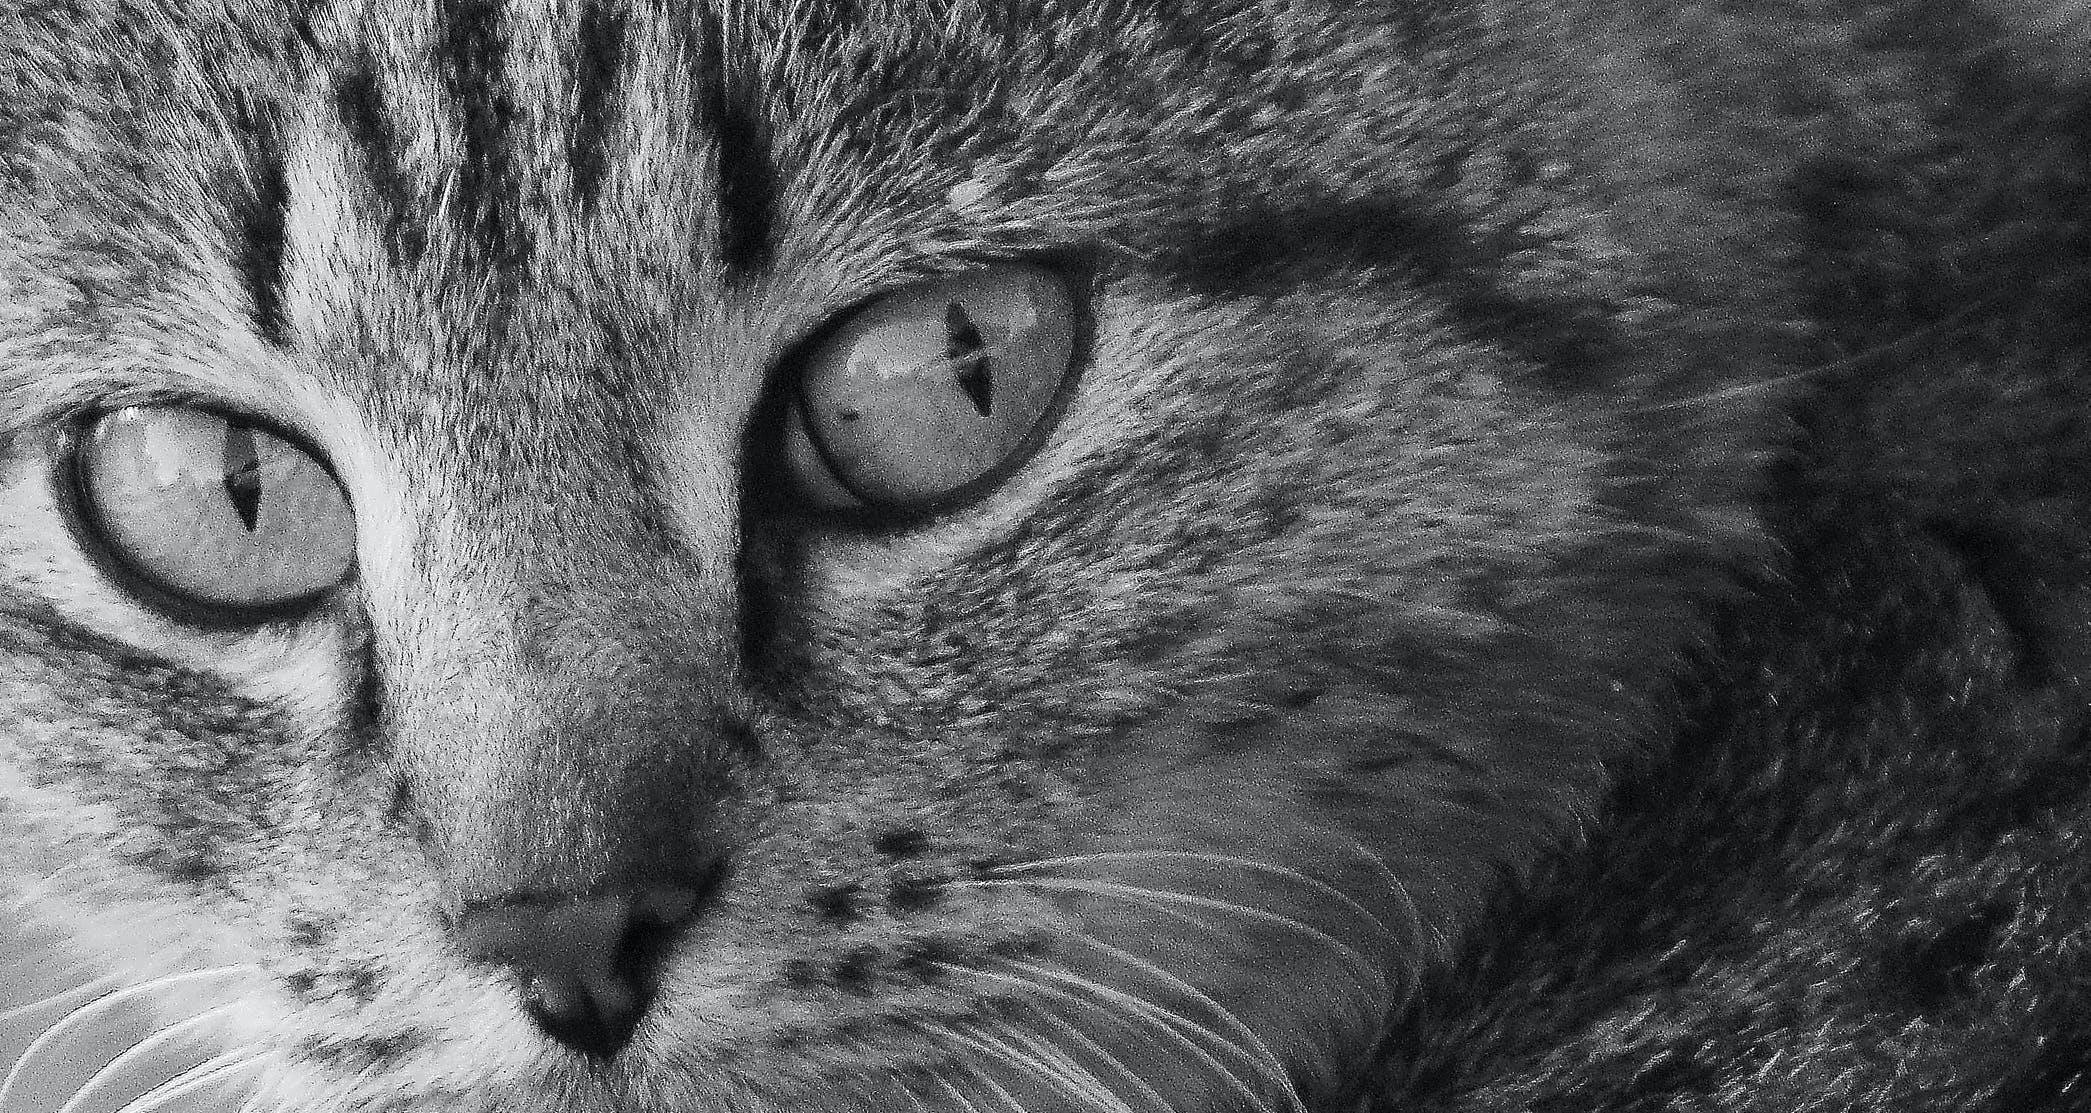 Free stock photo of cat, domestic animal